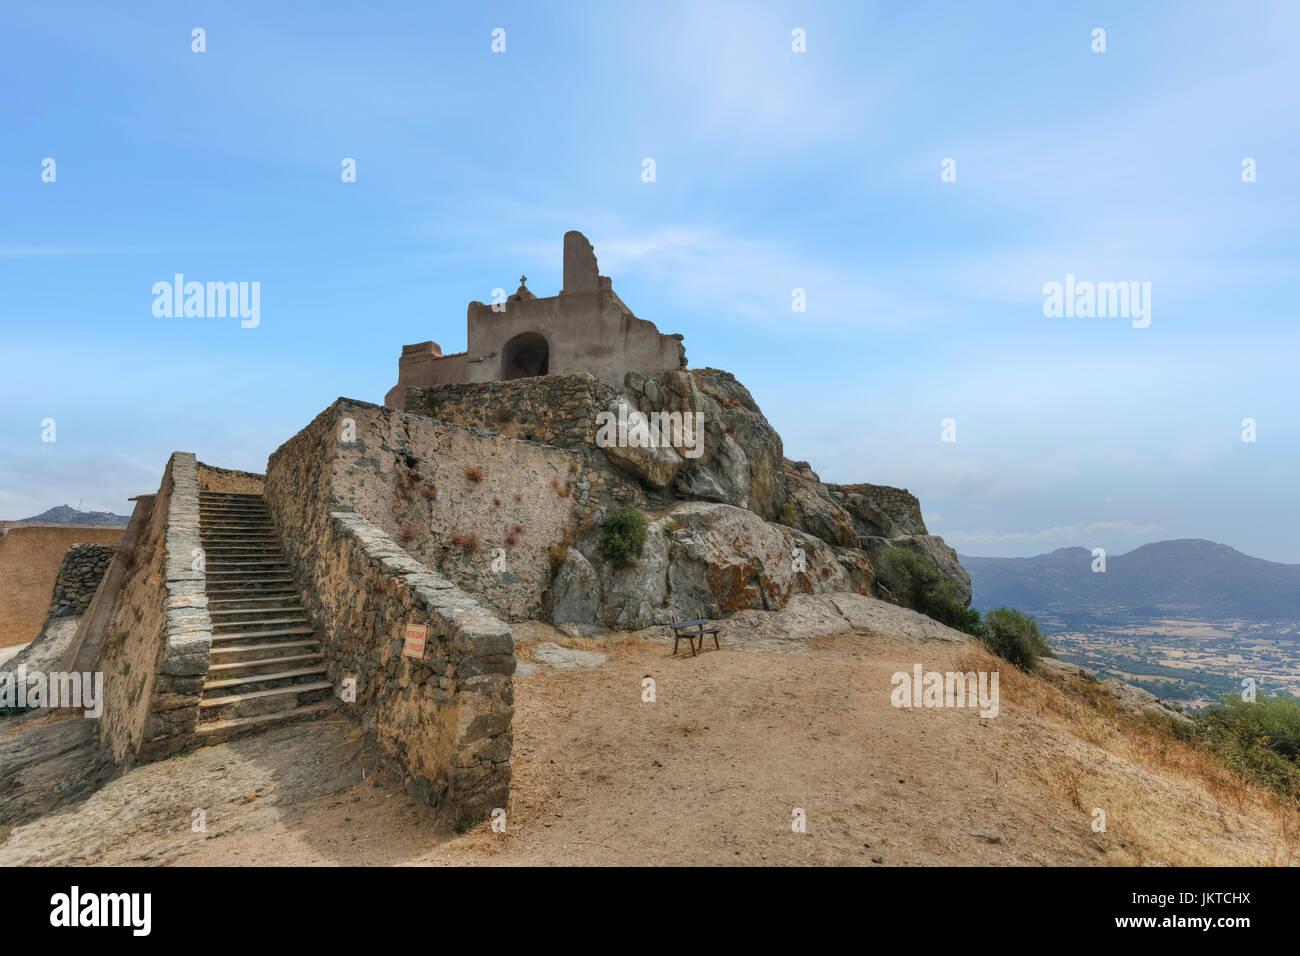 Corbara, Corsica, France - Stock Image